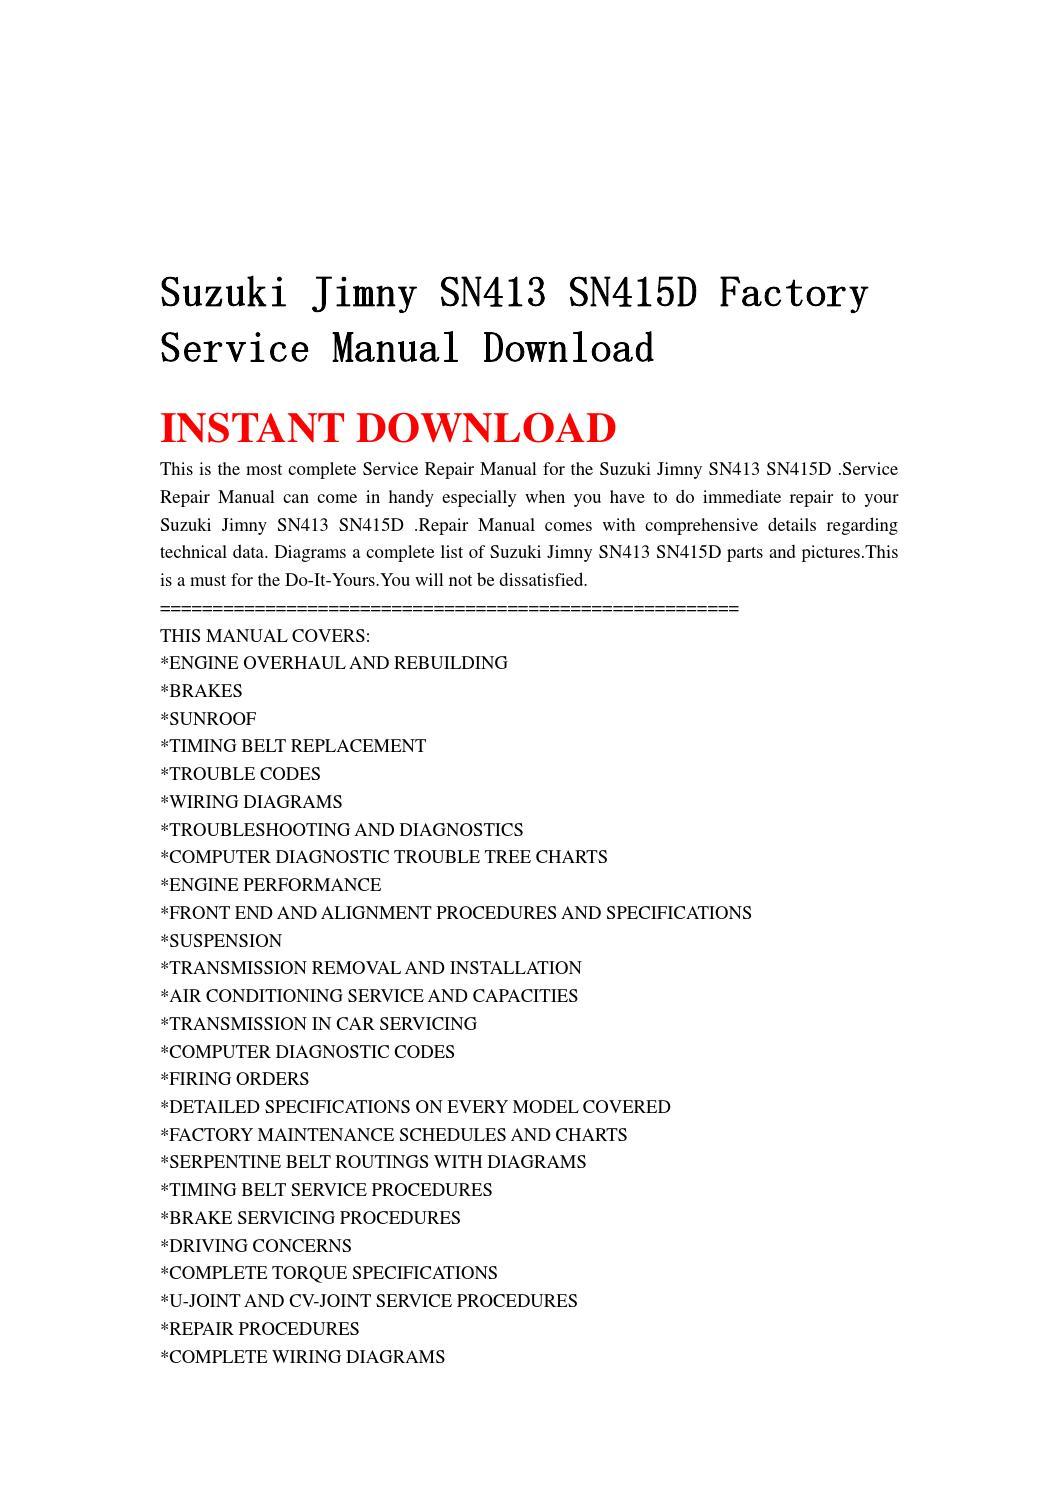 Suzuki Jimny Sn413 Sn415d Factory Service Manual Download